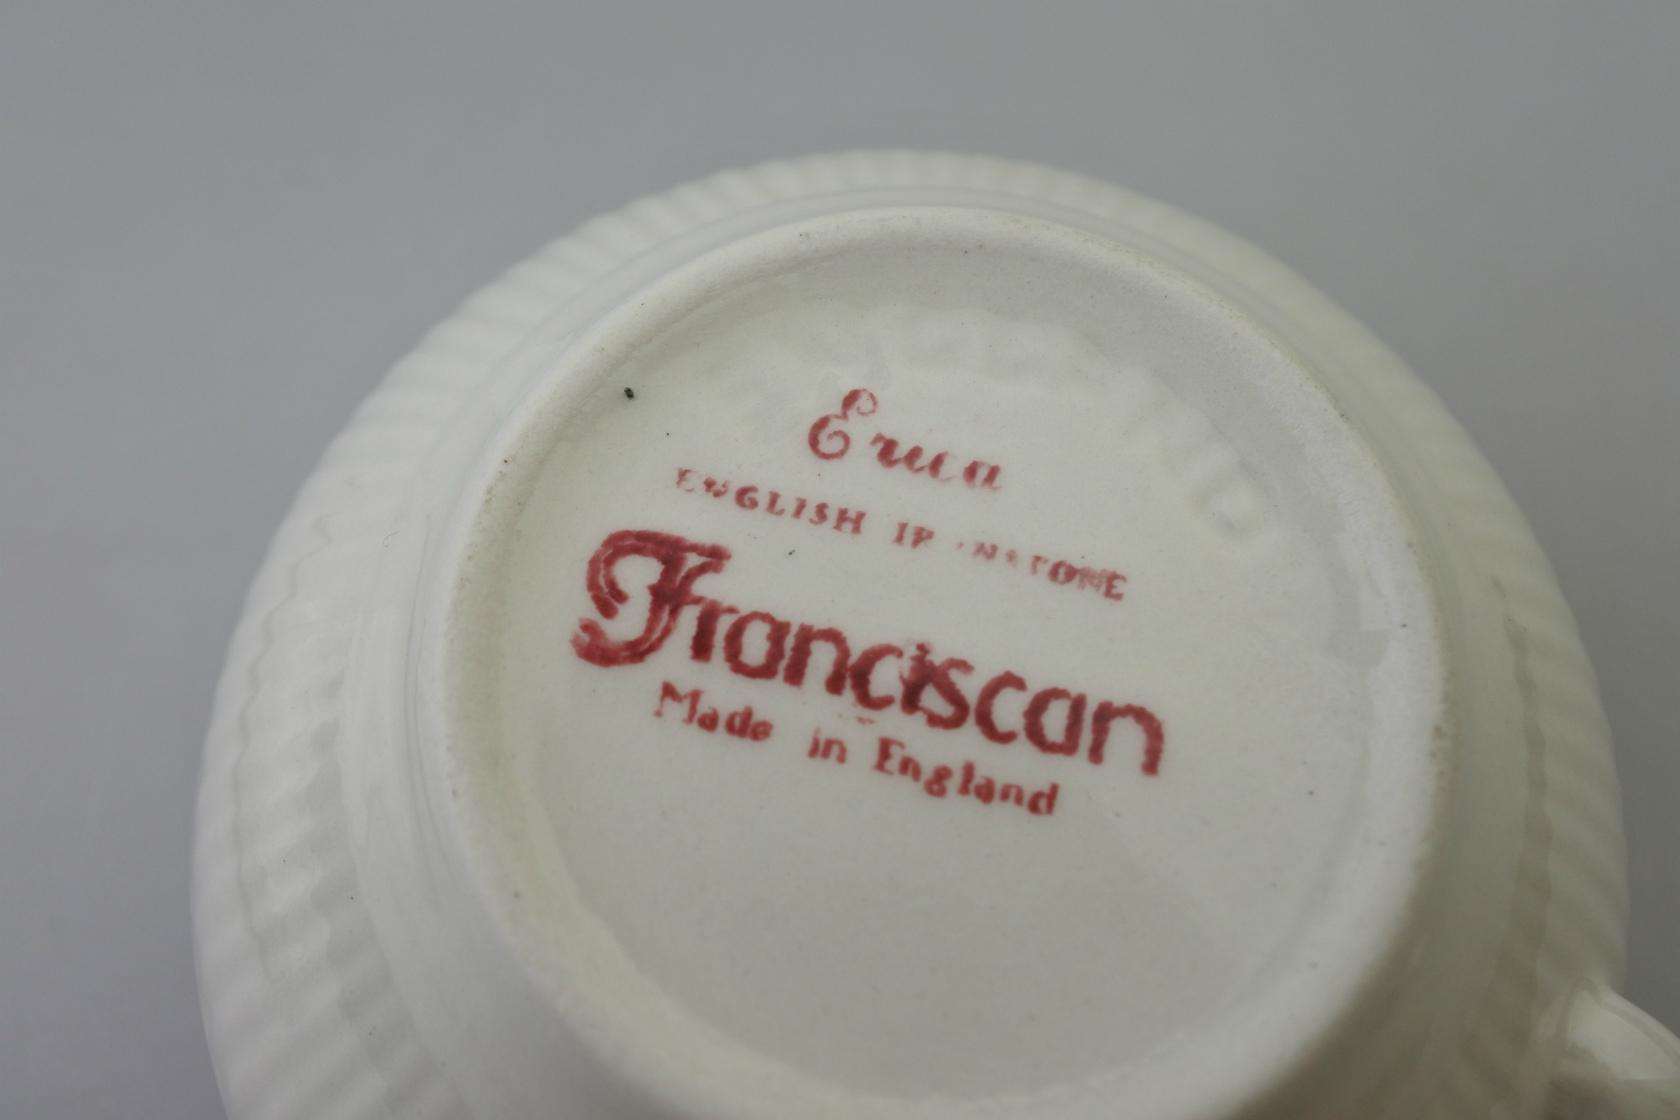 vi-franciscan-erica-c-s